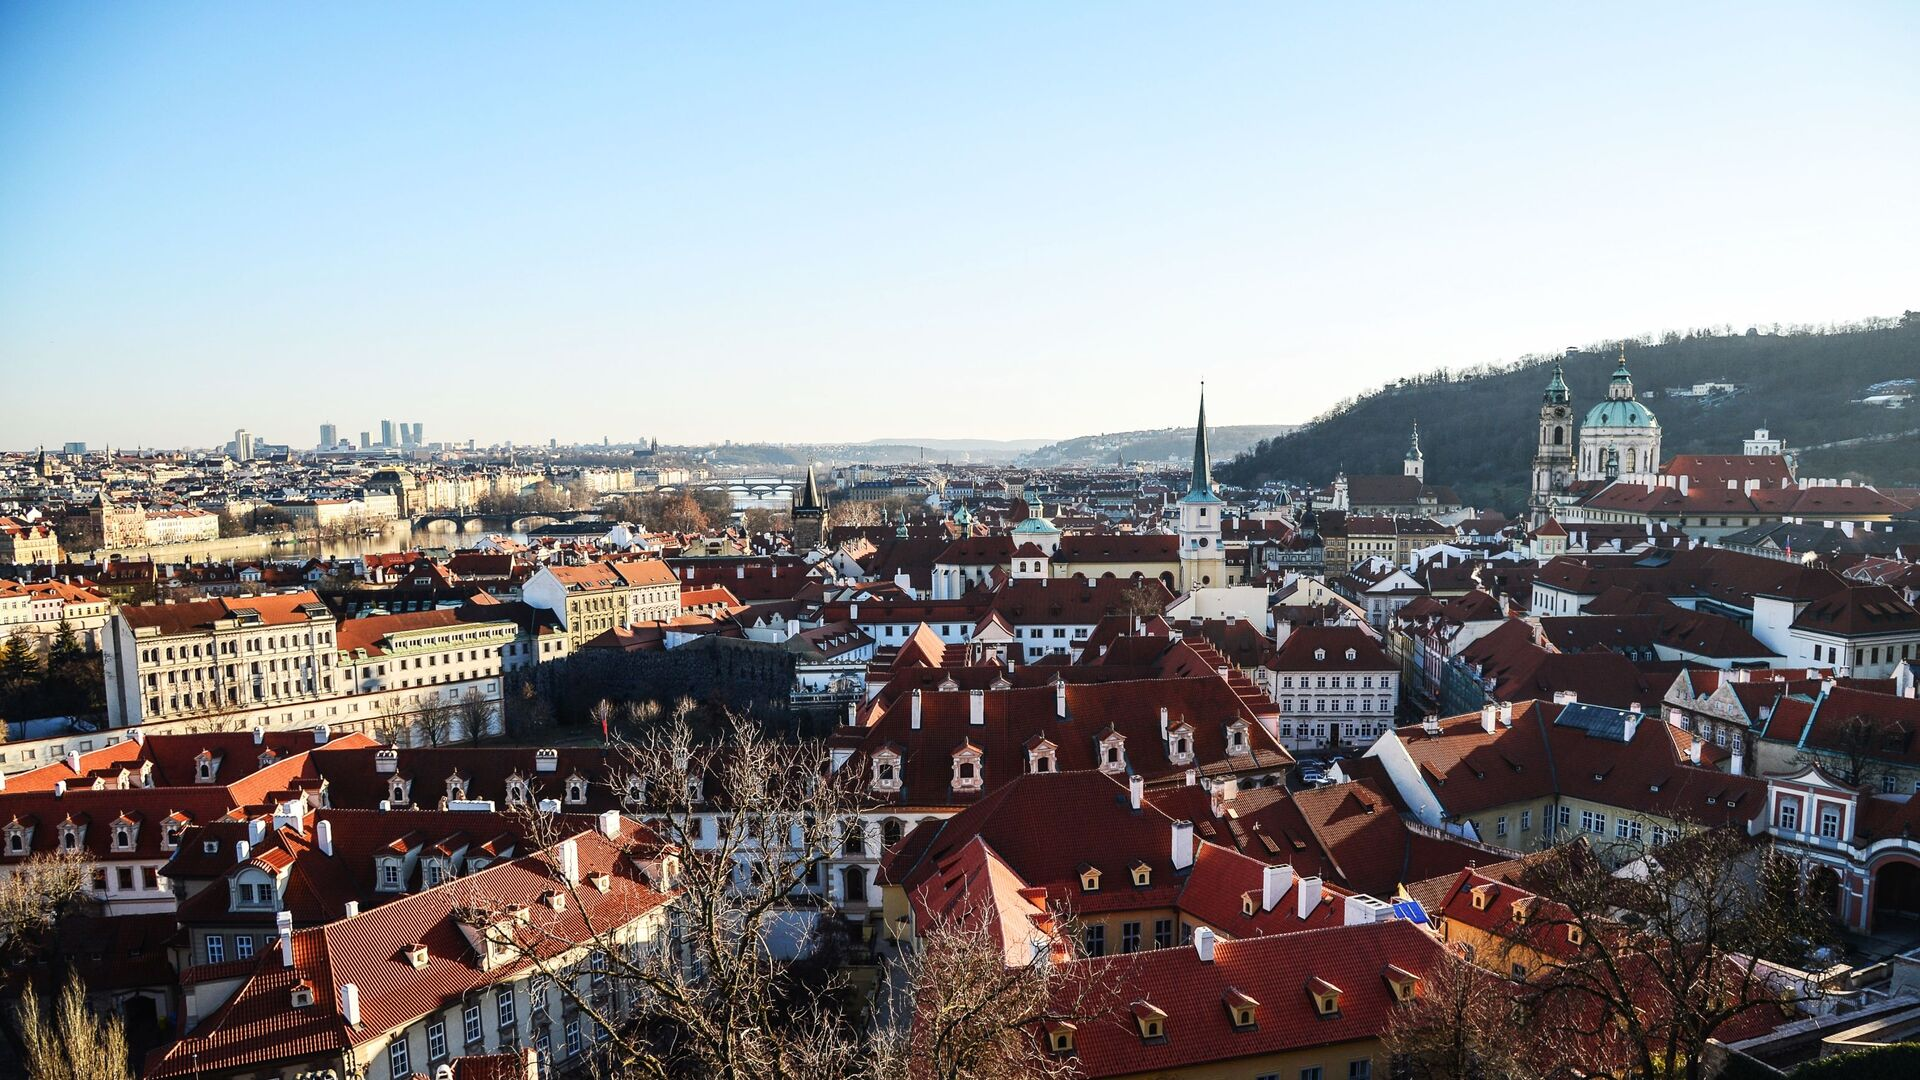 Глава Минюста Чехии опровергла слова Земана о взрывах во Врбетице